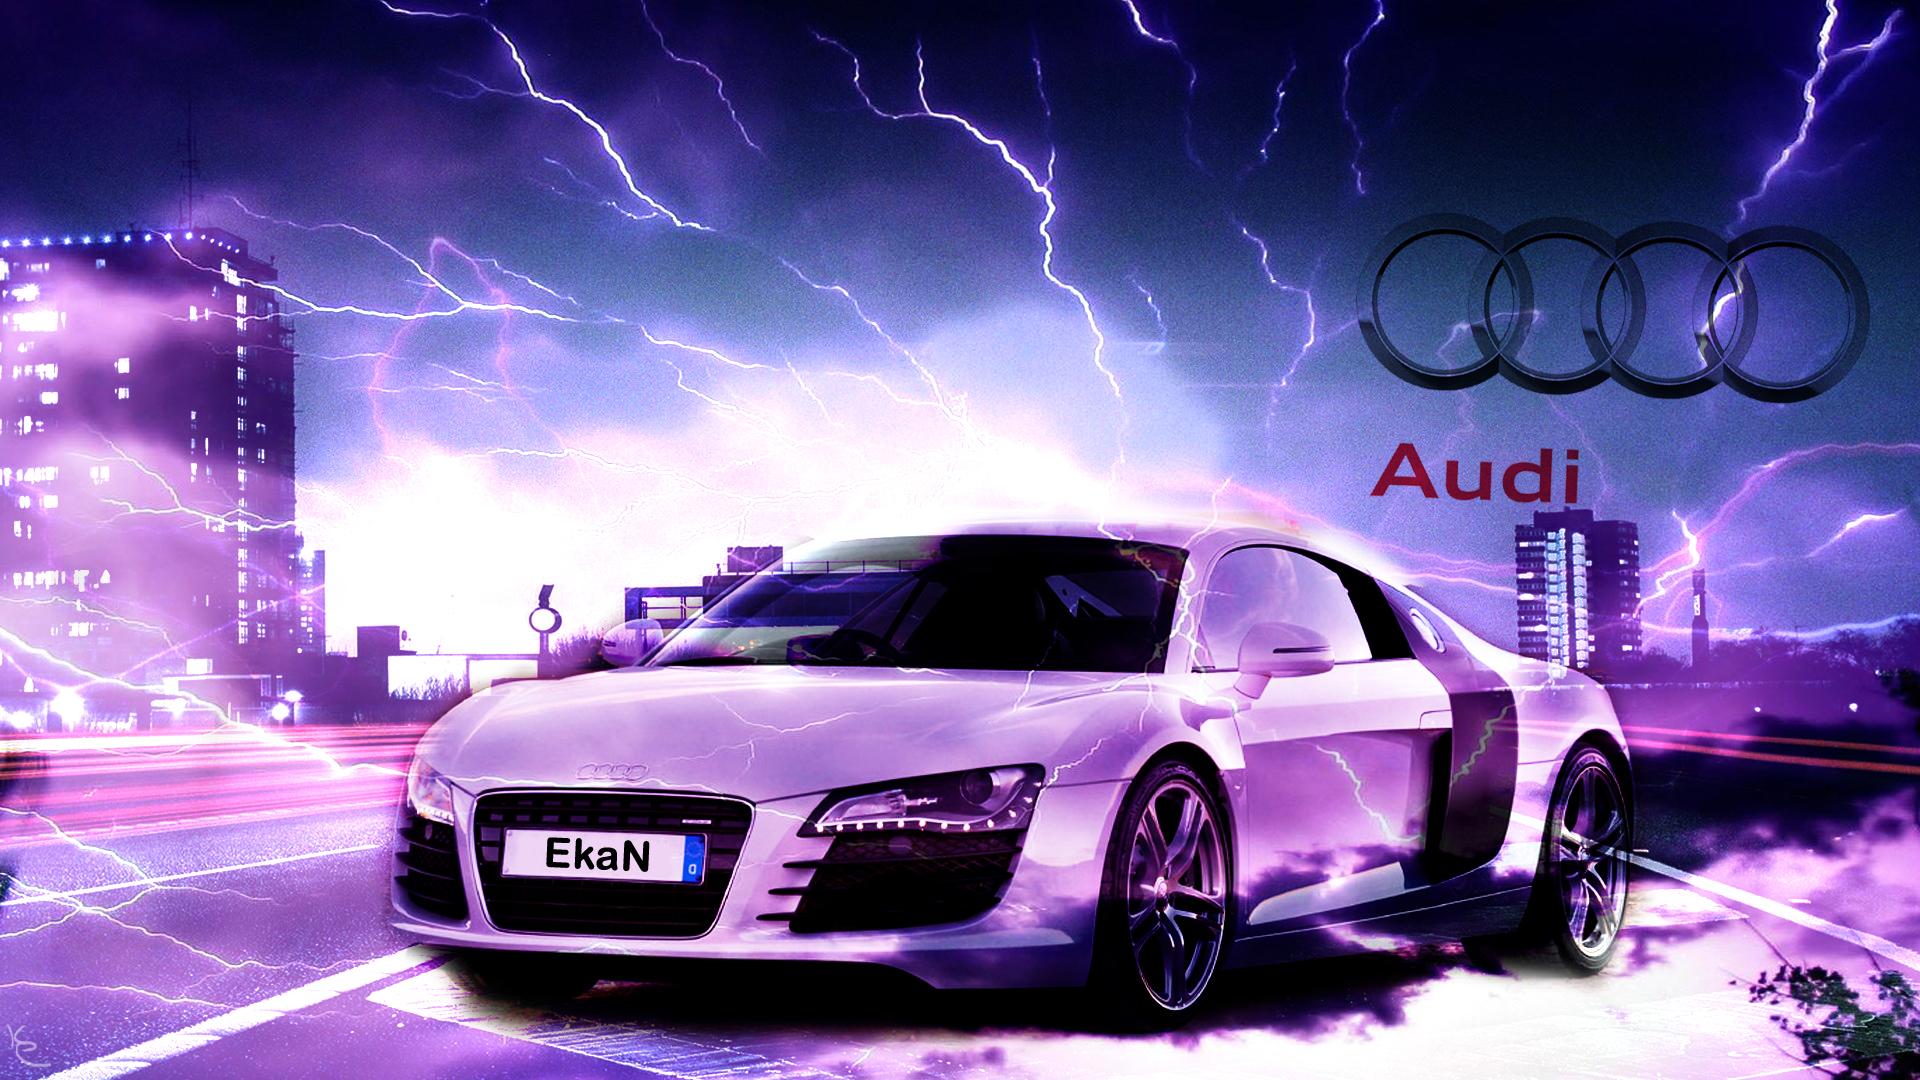 Audi a8 wallpaper free download 11